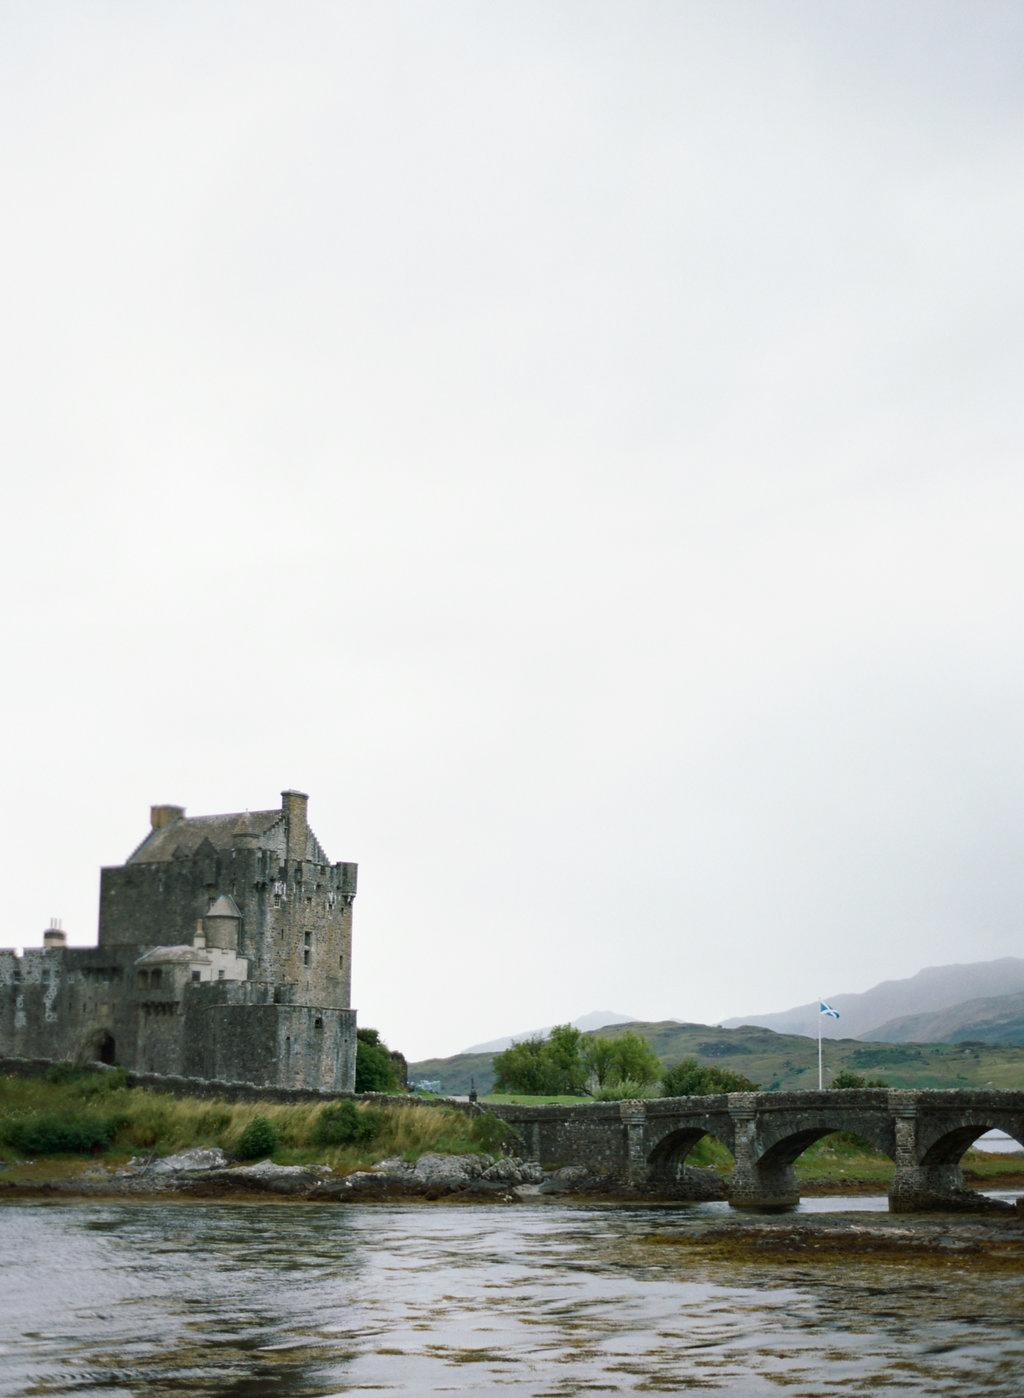 Scotland-Prewedding-highlands-castle-Engagment-Photos-Katie-Grant (6 of 139).jpg